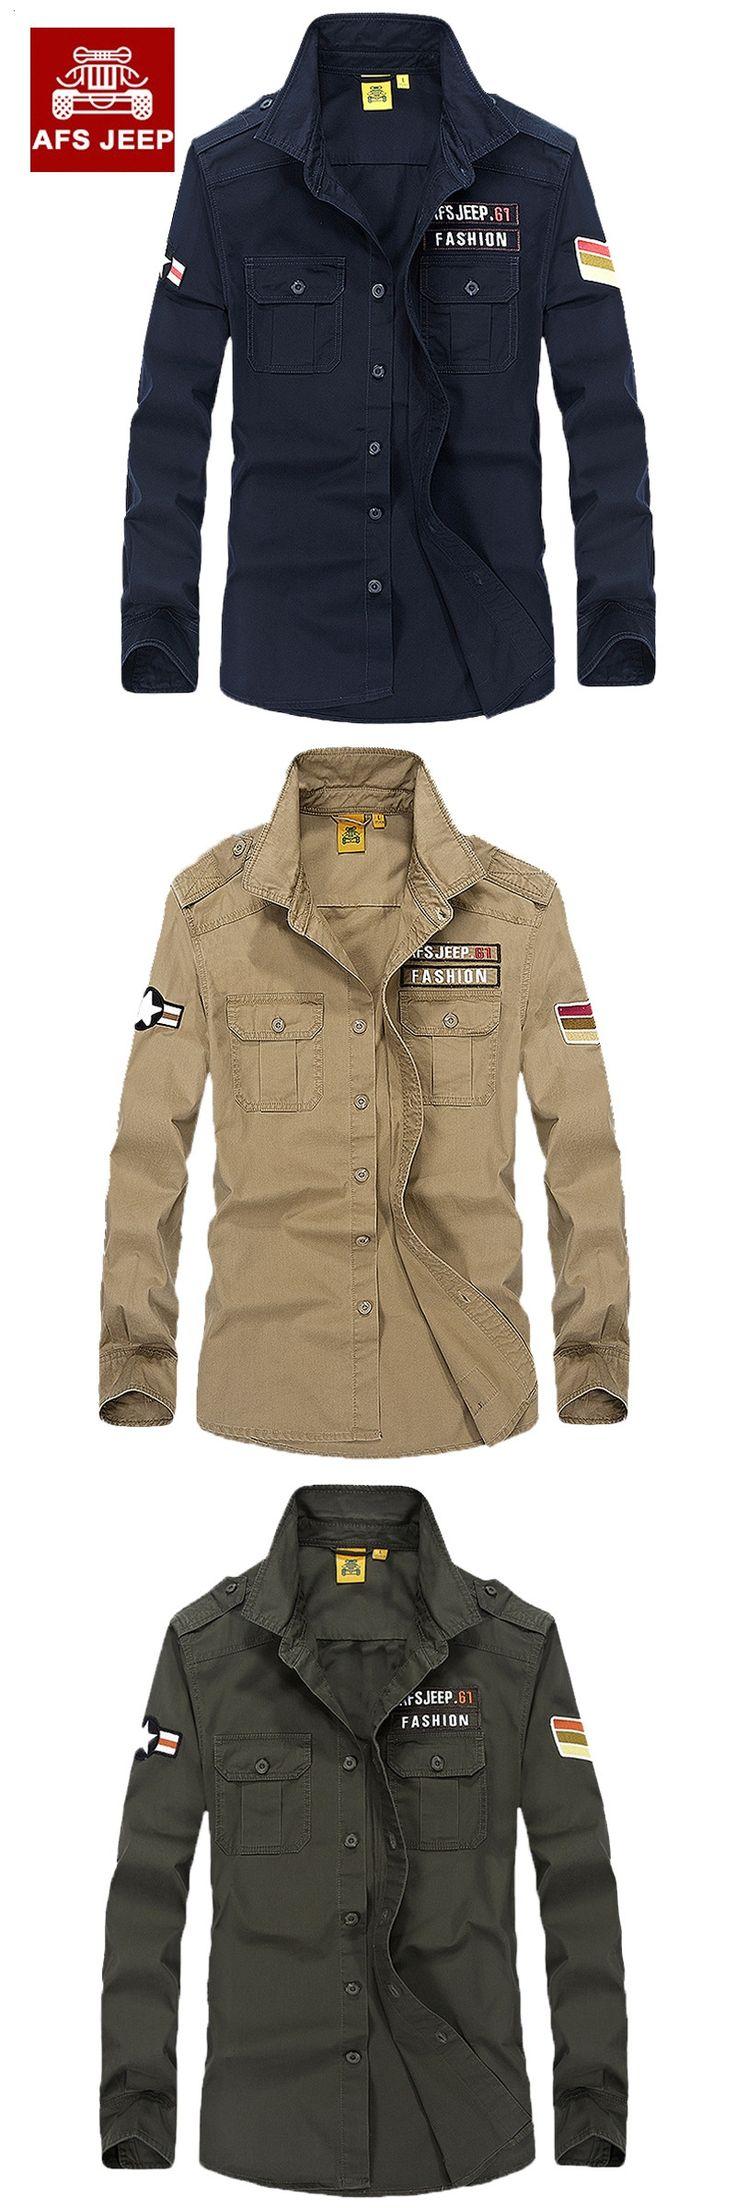 Brand 100% Cotton Men Combat Military Army Shirts Cargo Shirts Uniform Long Sleeve Men's Spring Casual Shirts Camisas 2001